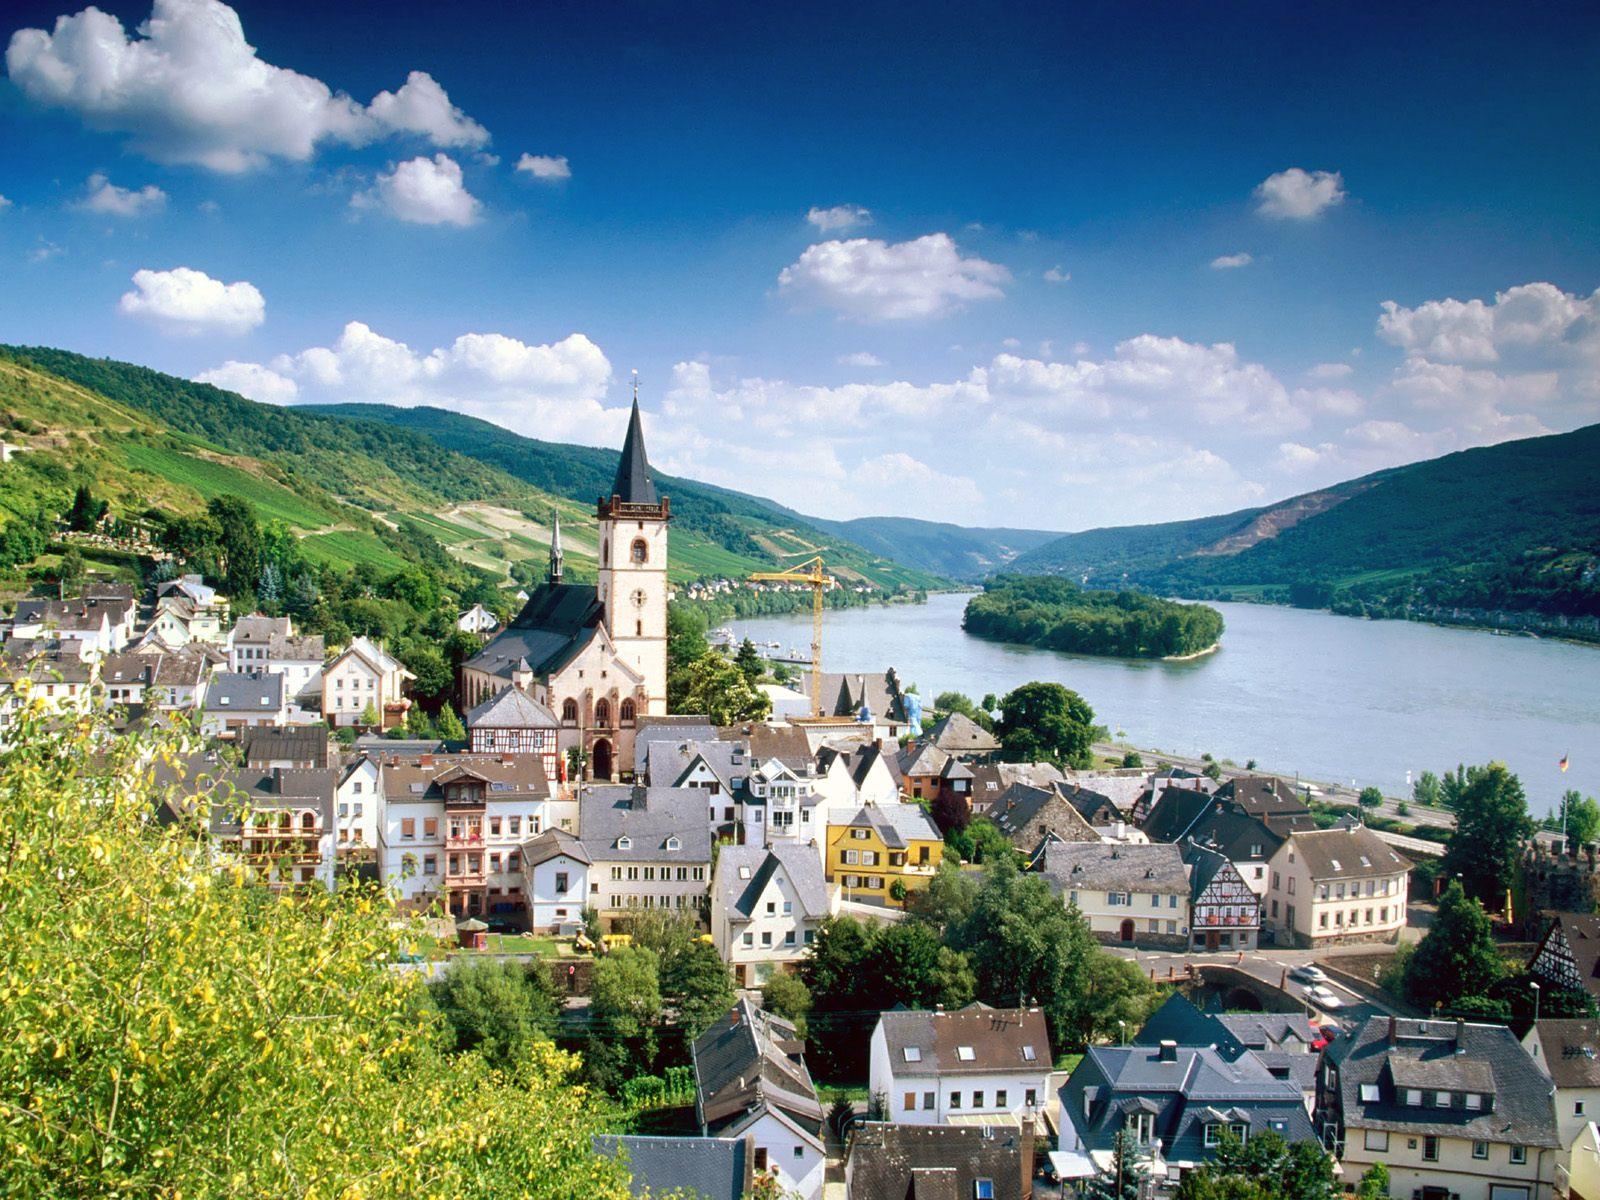 Lorch Village Hesse Rhine River Germany   Wallpaper 11704 1600x1200